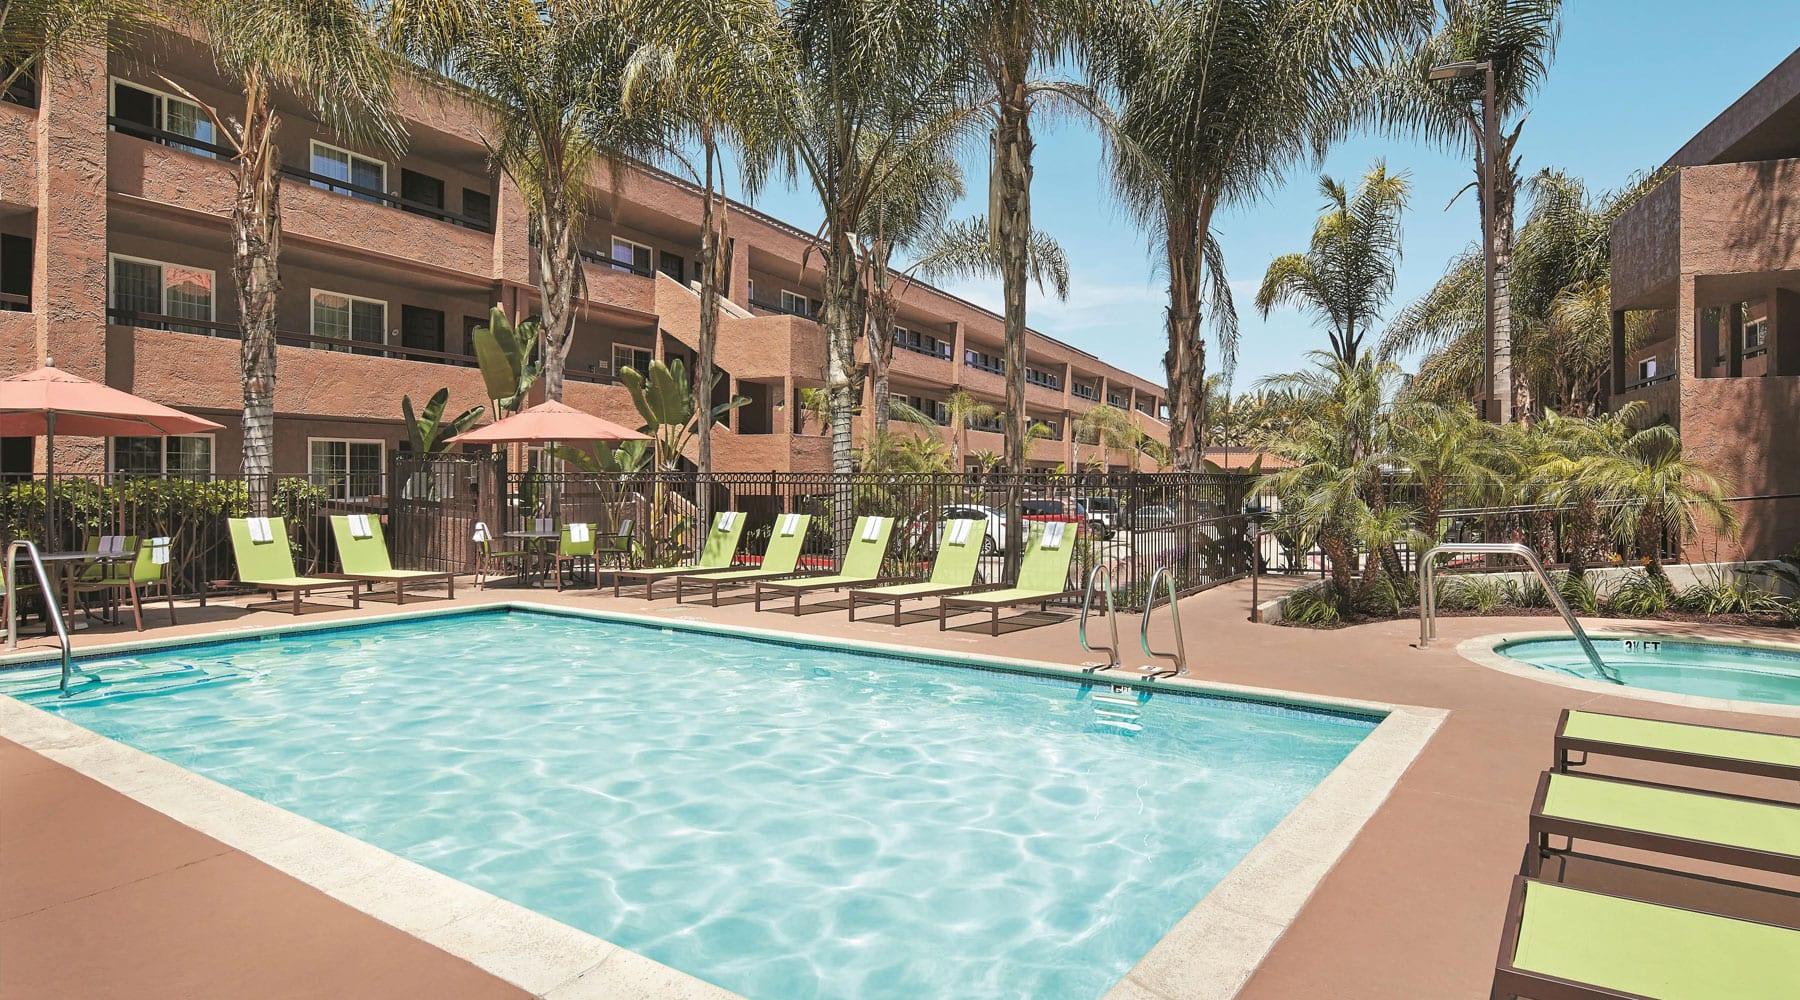 La Quinta Inn & Suites San Diego Old Town